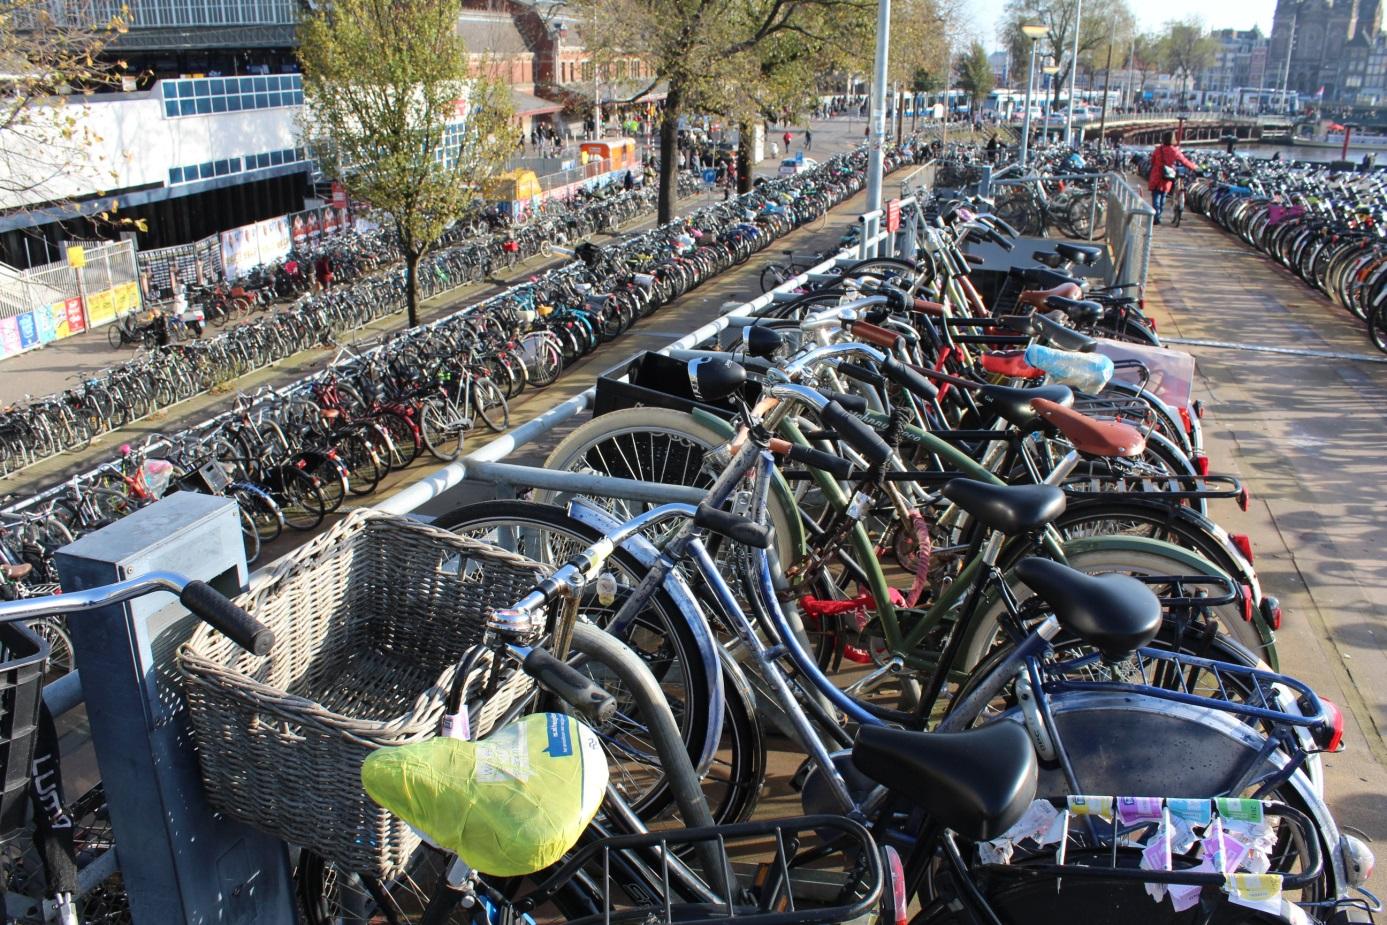 Braunschweig Bike it – Like it!